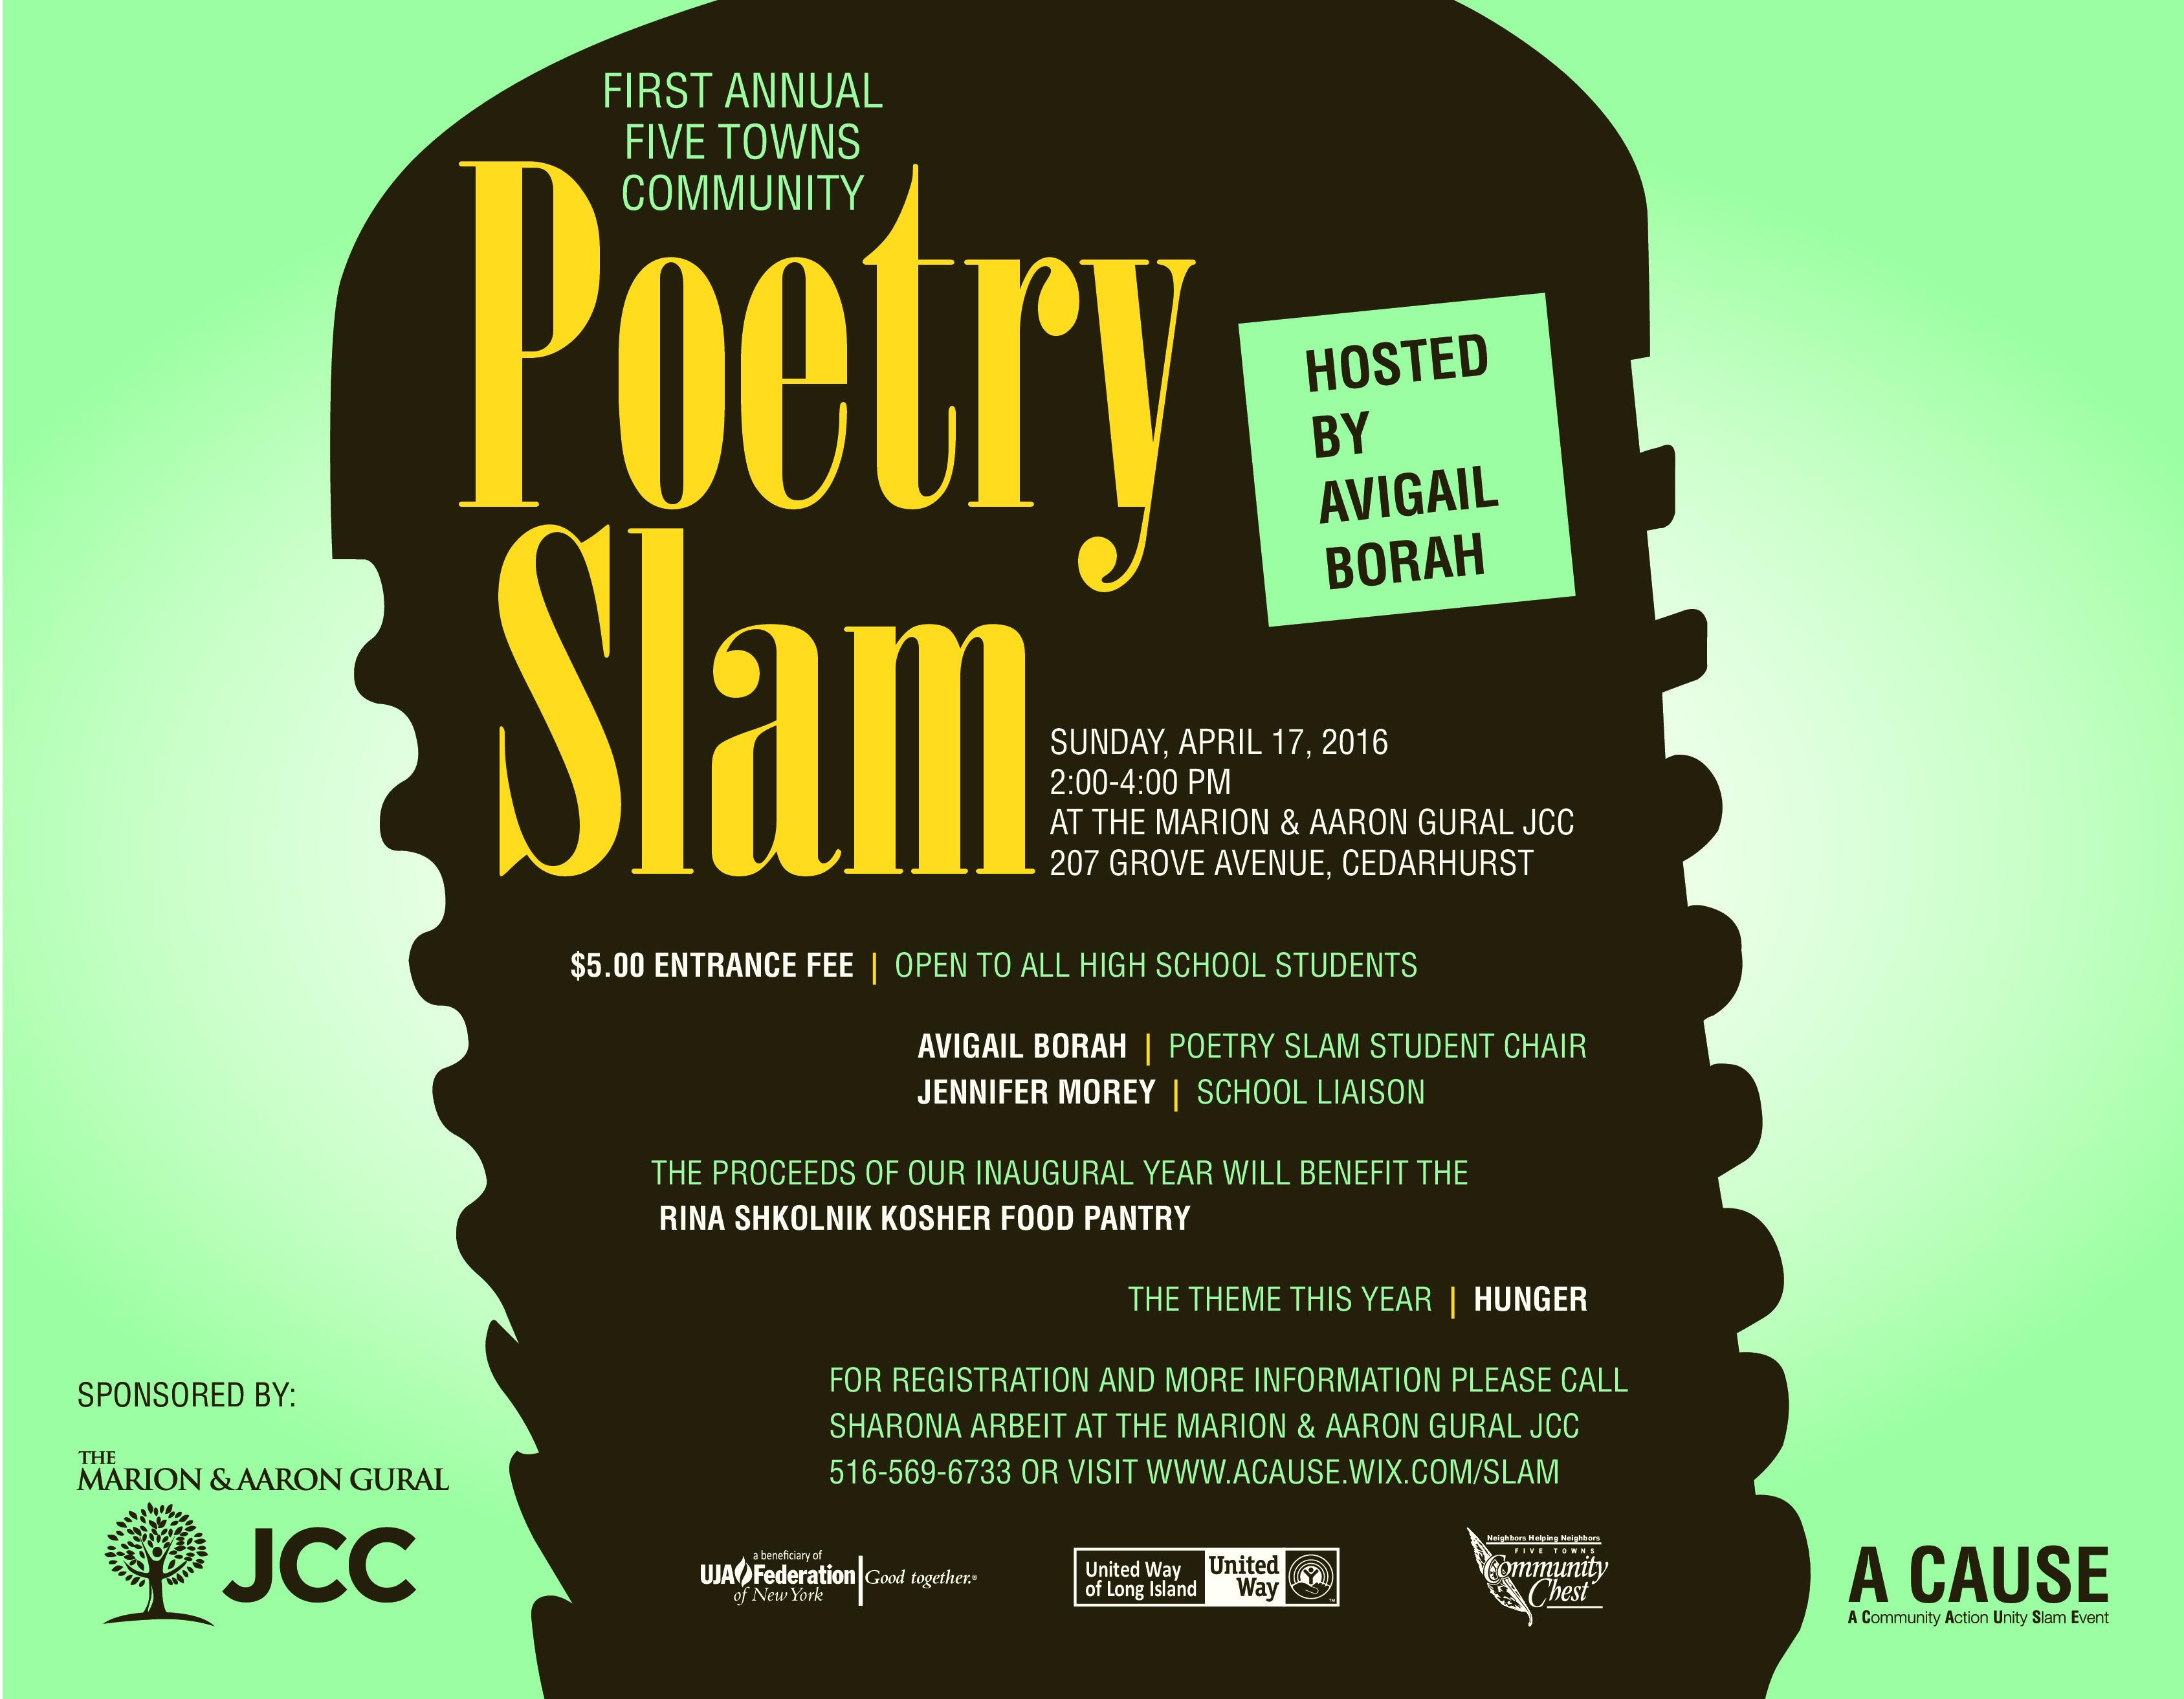 Teen Poetry Slam - The Marion & Aaron Gural JCC